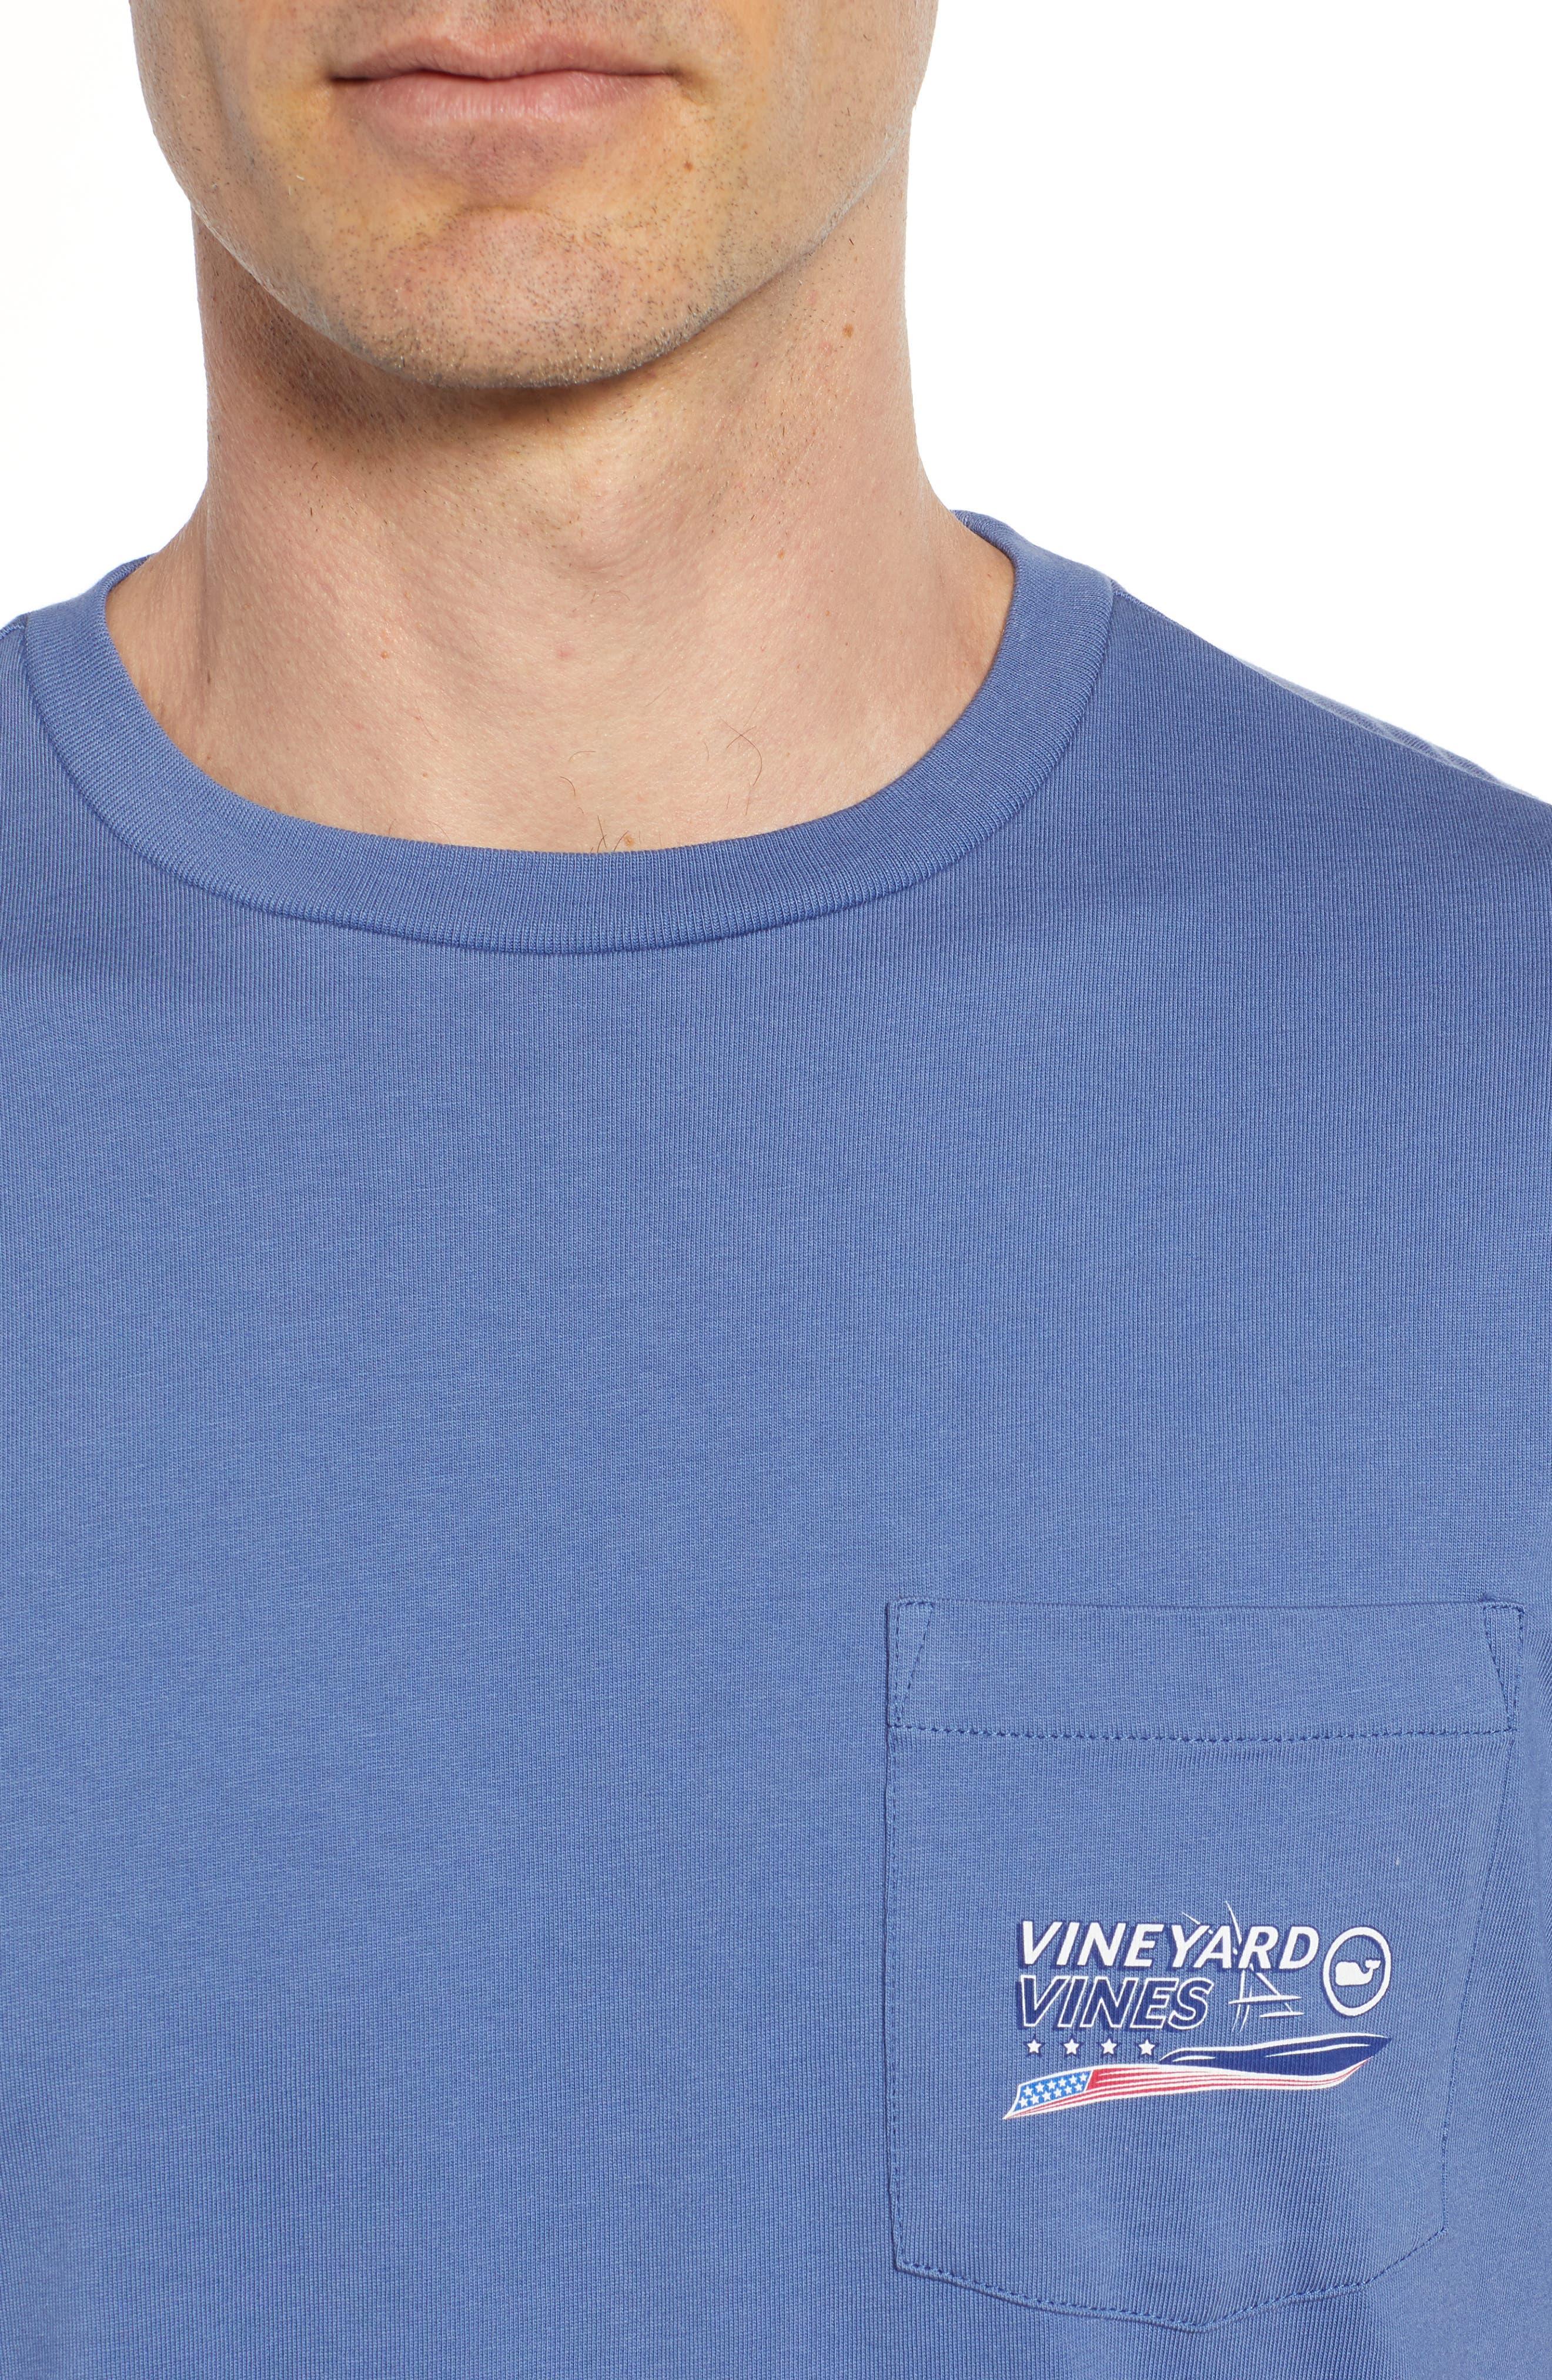 American Sportfisher T-Shirt,                             Alternate thumbnail 4, color,                             Moonshine